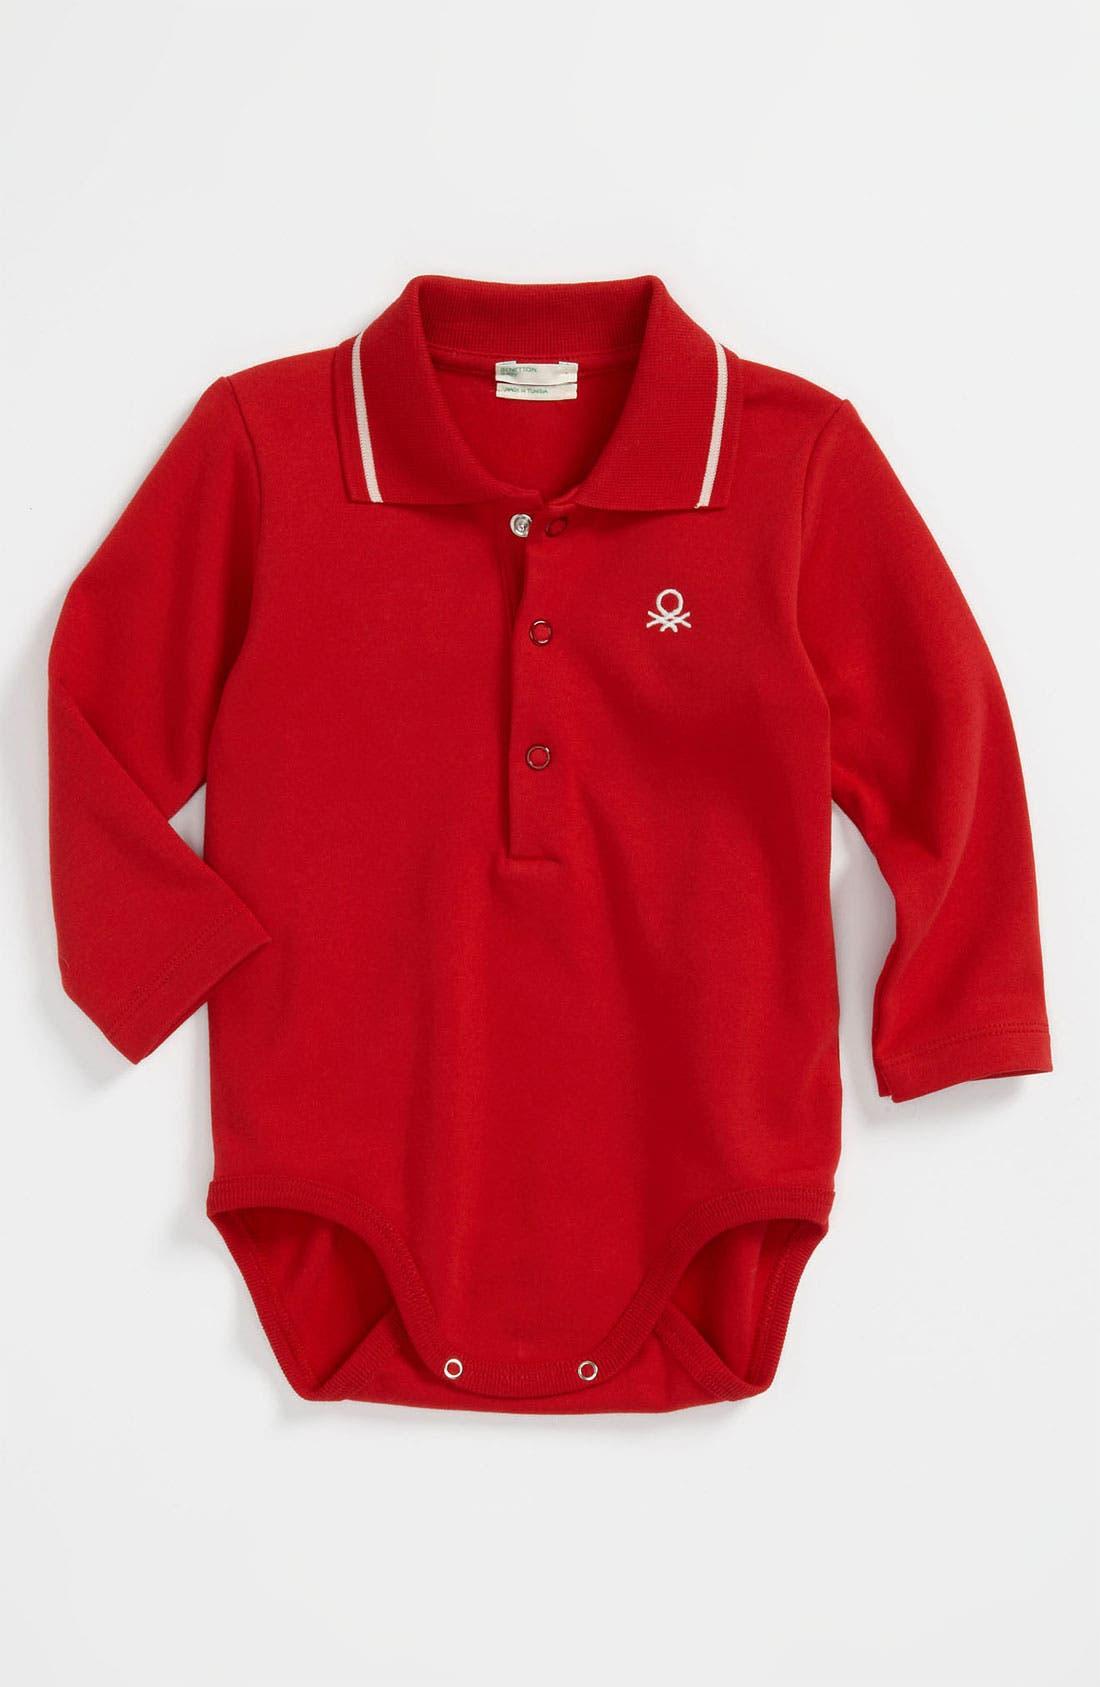 Alternate Image 1 Selected - United Colors of Benetton Kids Polo Bodysuit (Infant)